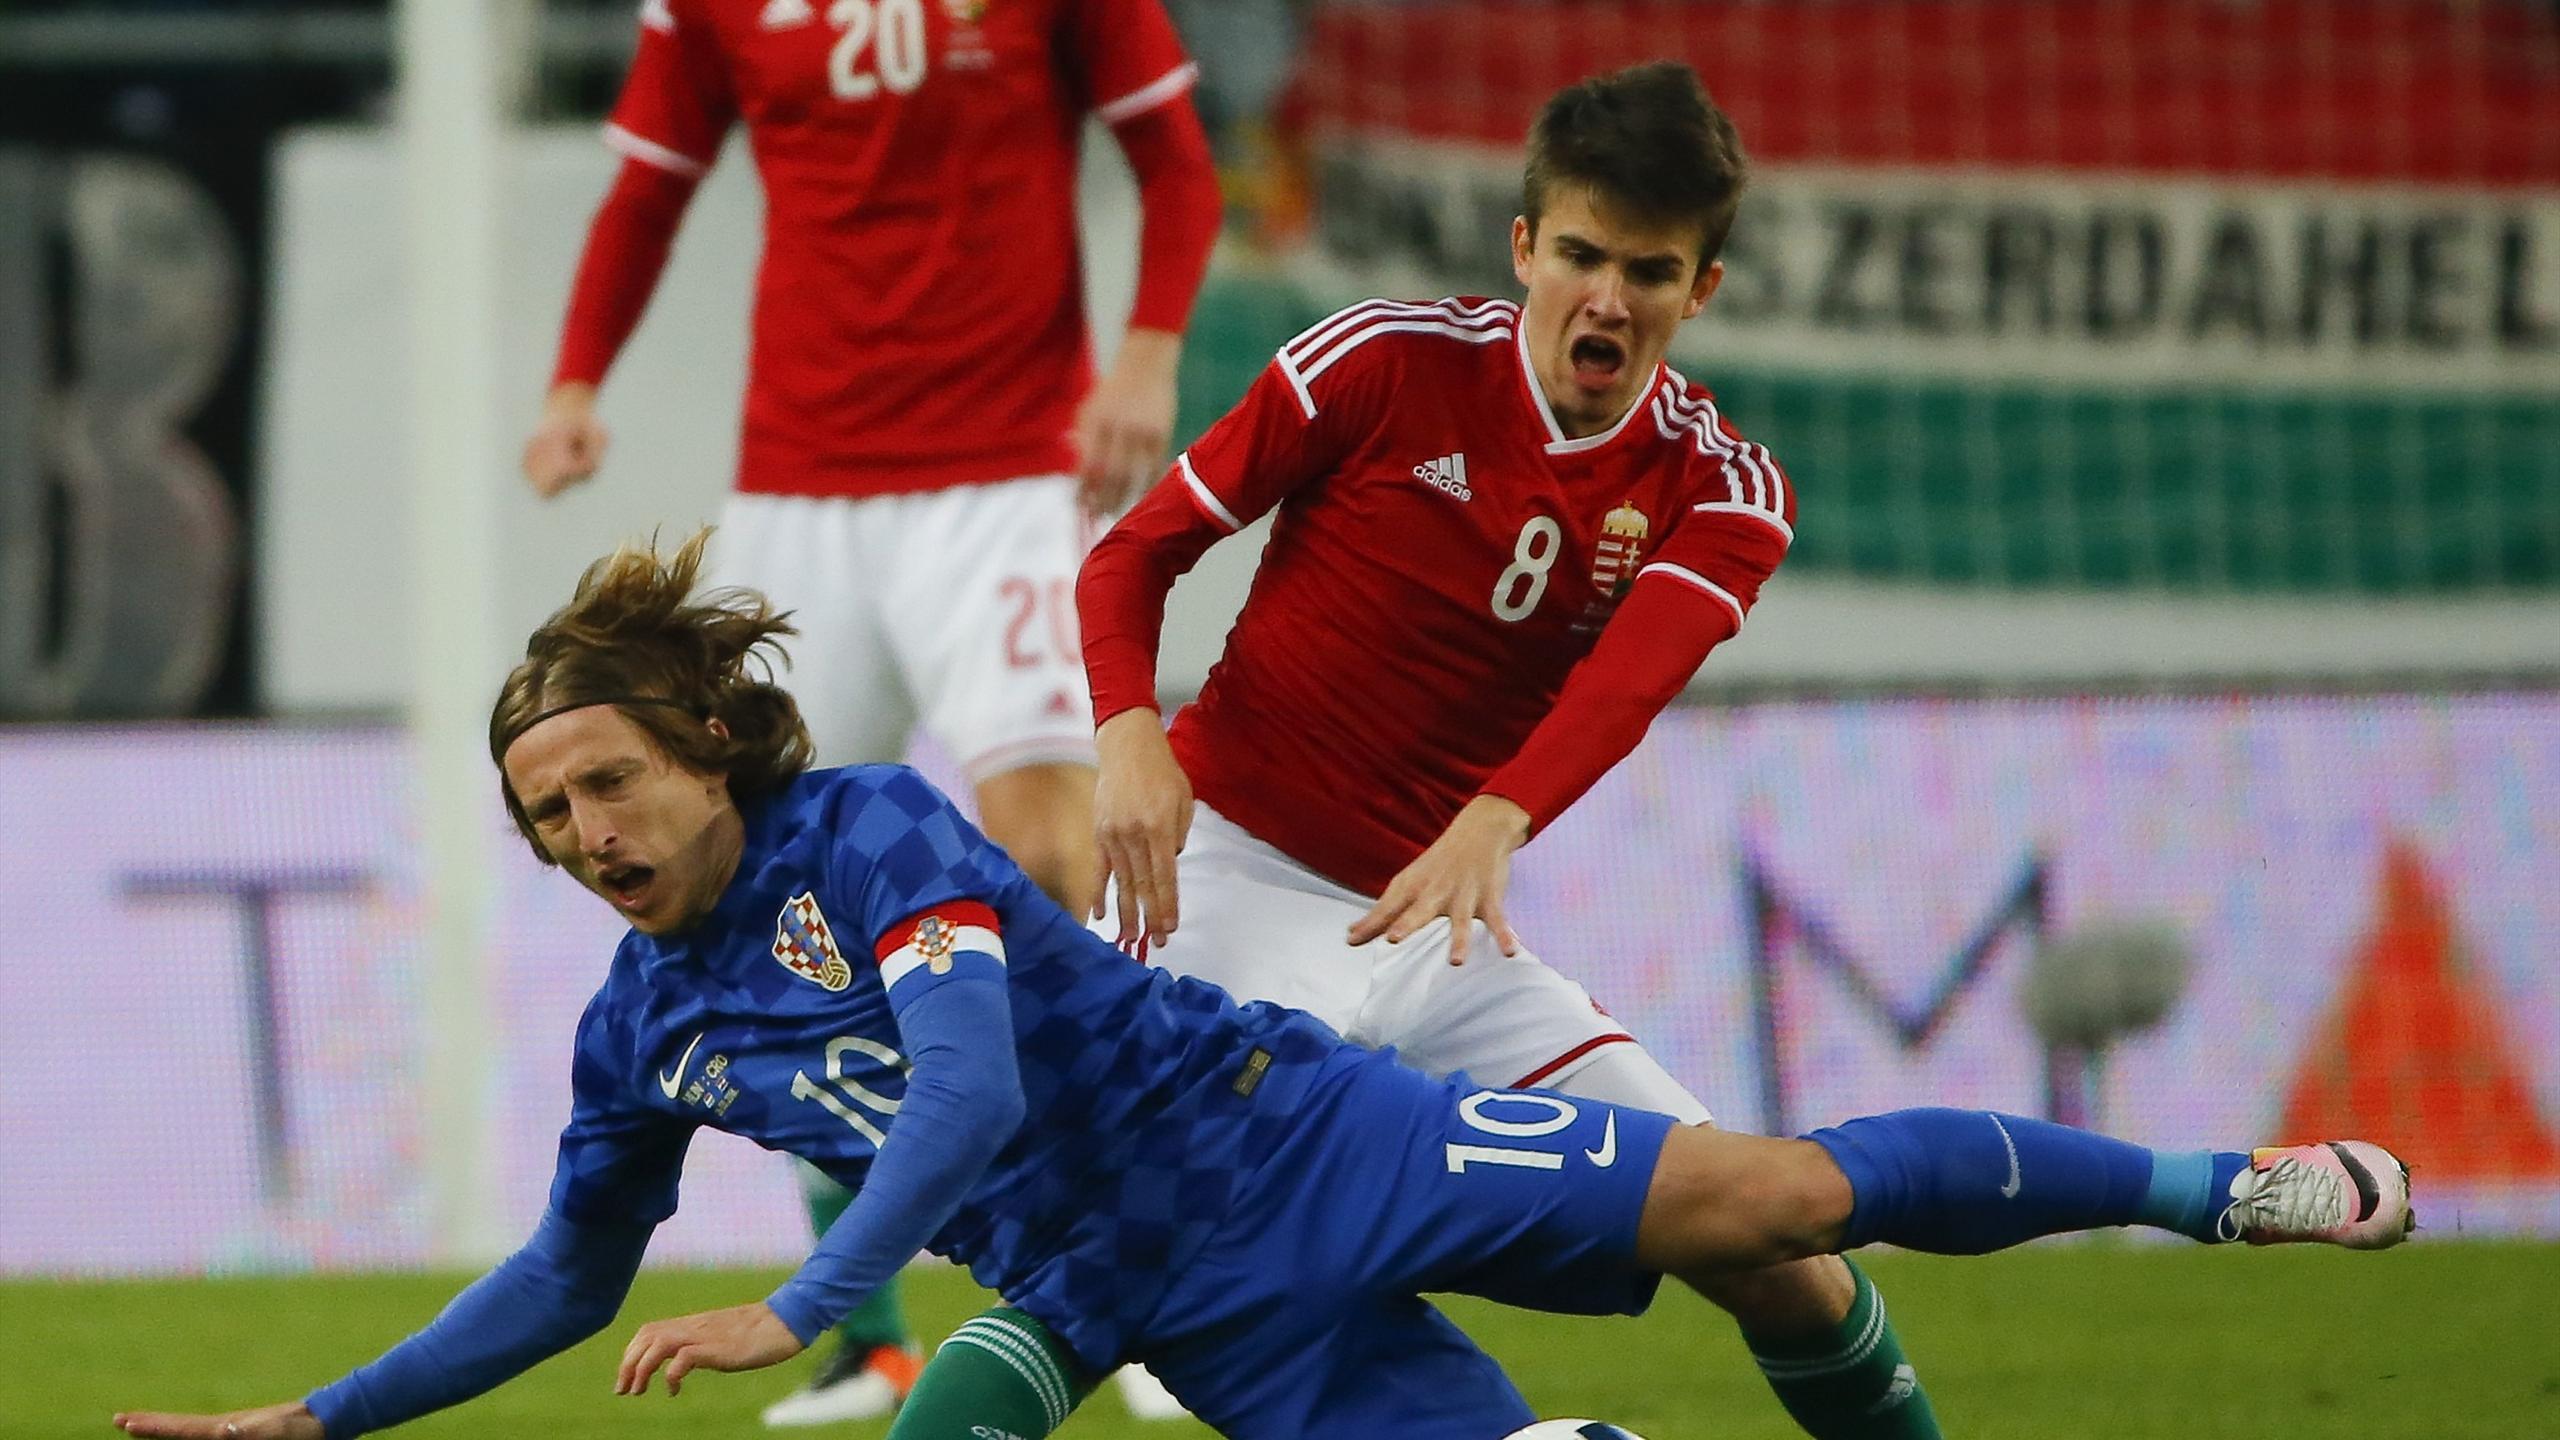 Hungary's Adam Nagy and Croatia's Luka Modric in action